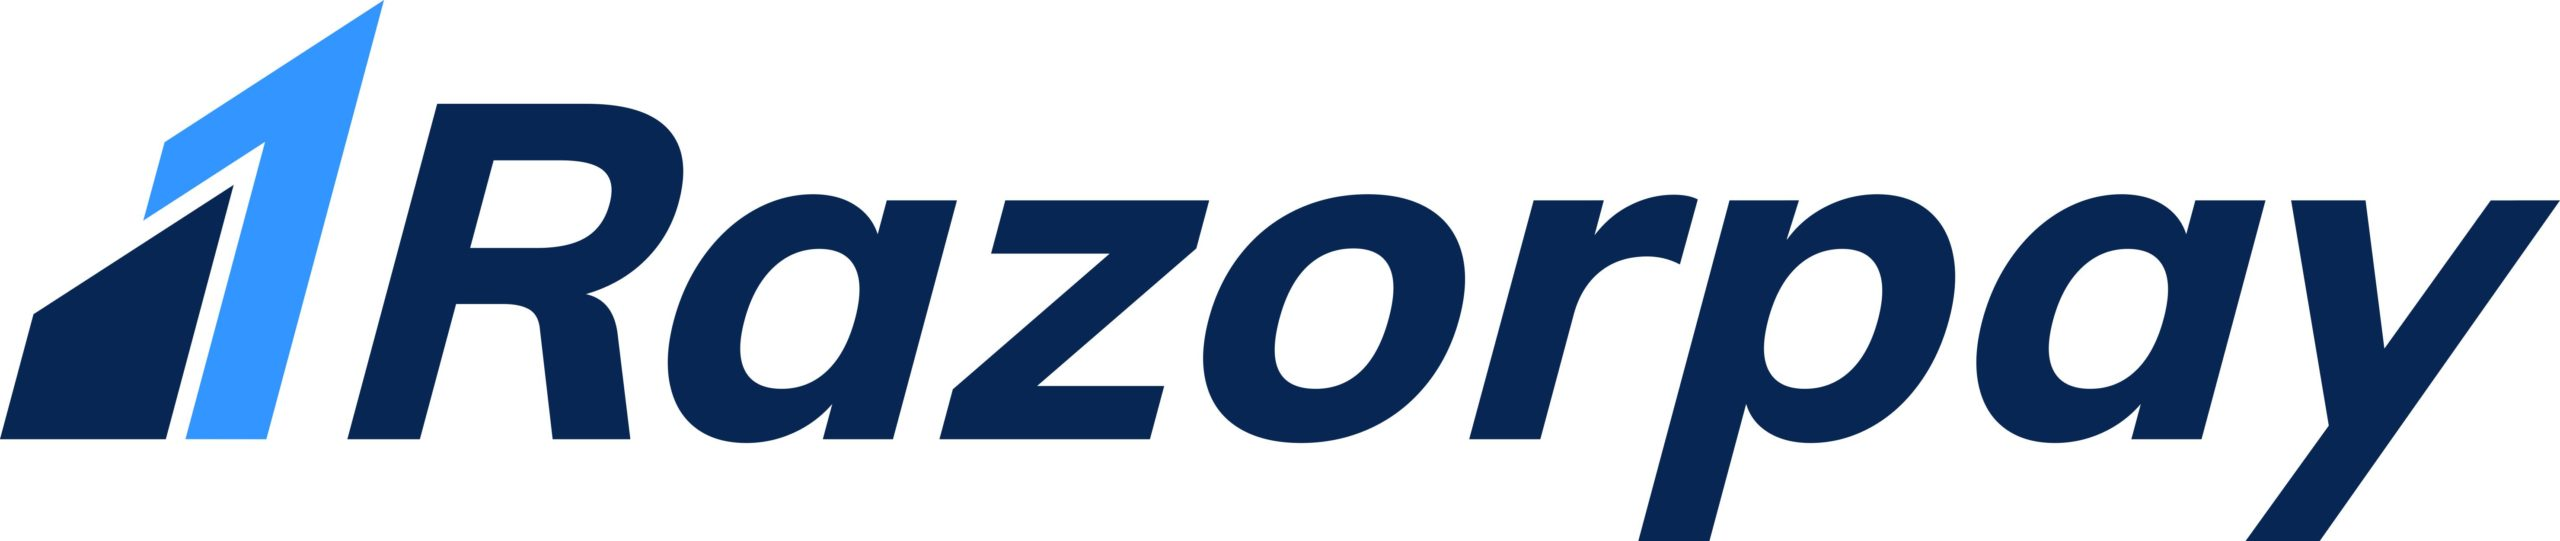 The D2C Summit Sponsor - Razorpay